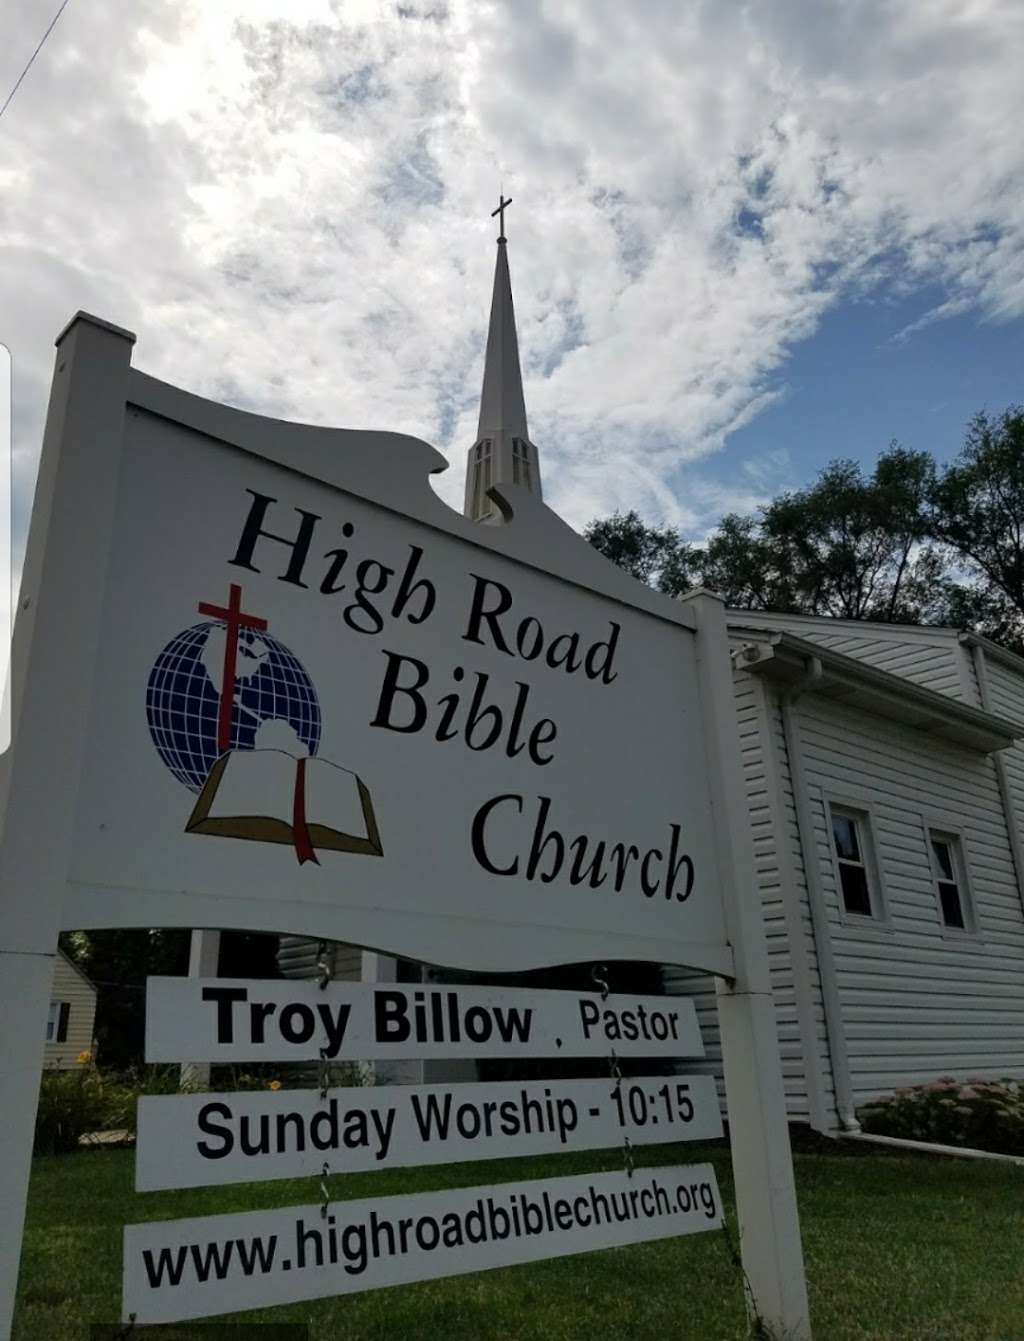 High Road Bible Church - church    Photo 1 of 1   Address: 380 High Rd, Lockport, IL 60441, USA   Phone: (815) 838-6018